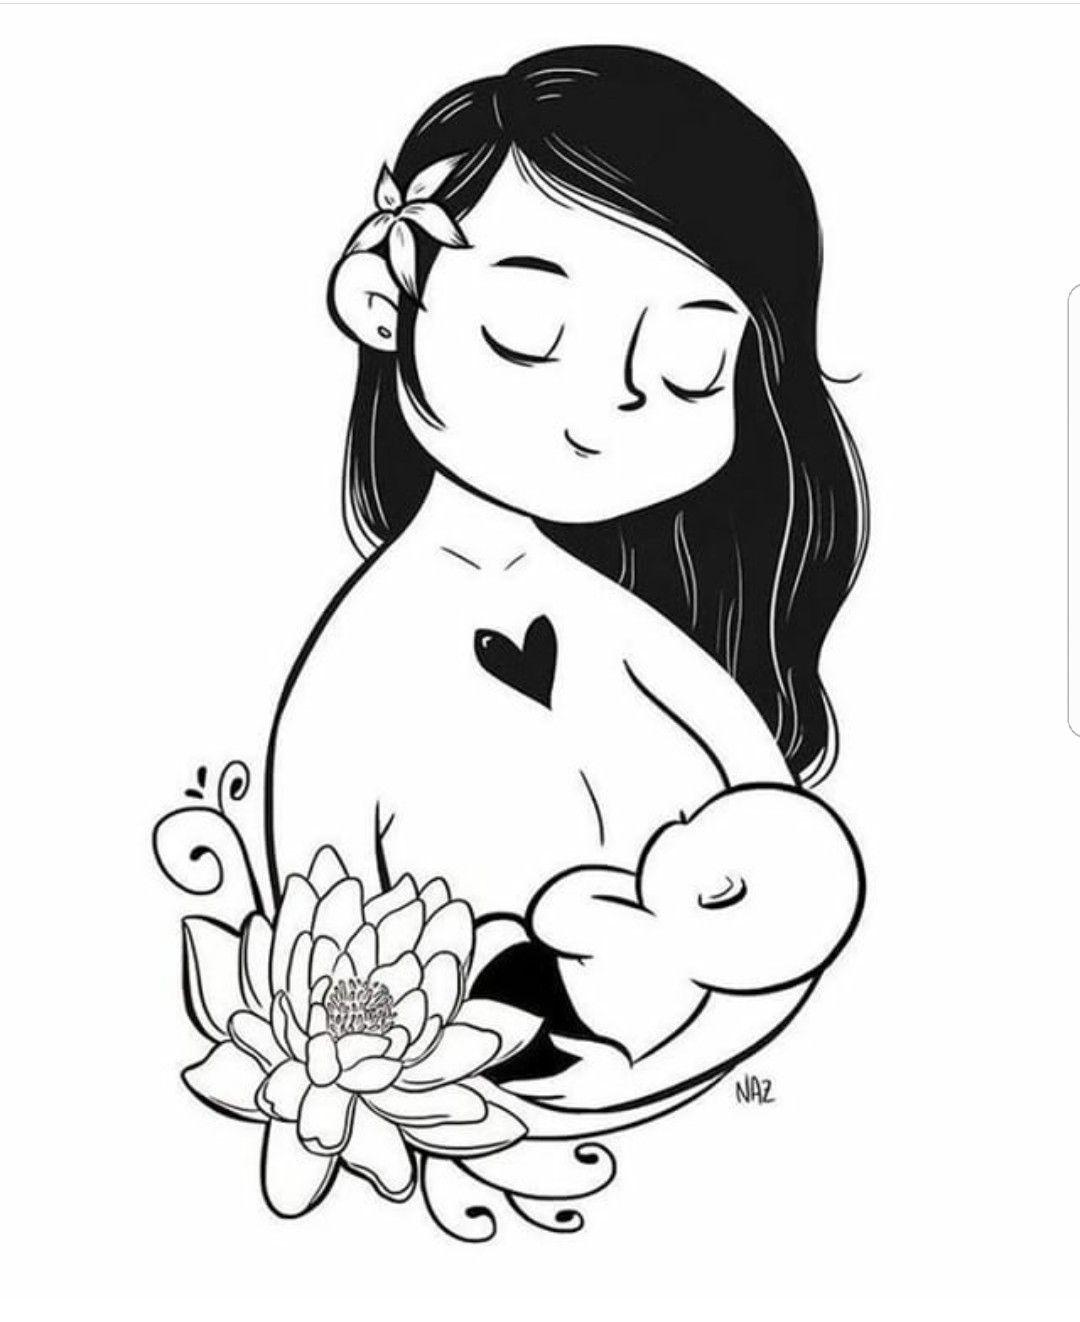 Minha Parte Mais Bonita Meu Eu Imagenes De Lactancia Materna Lactancia Materna Dibujo Para Mama